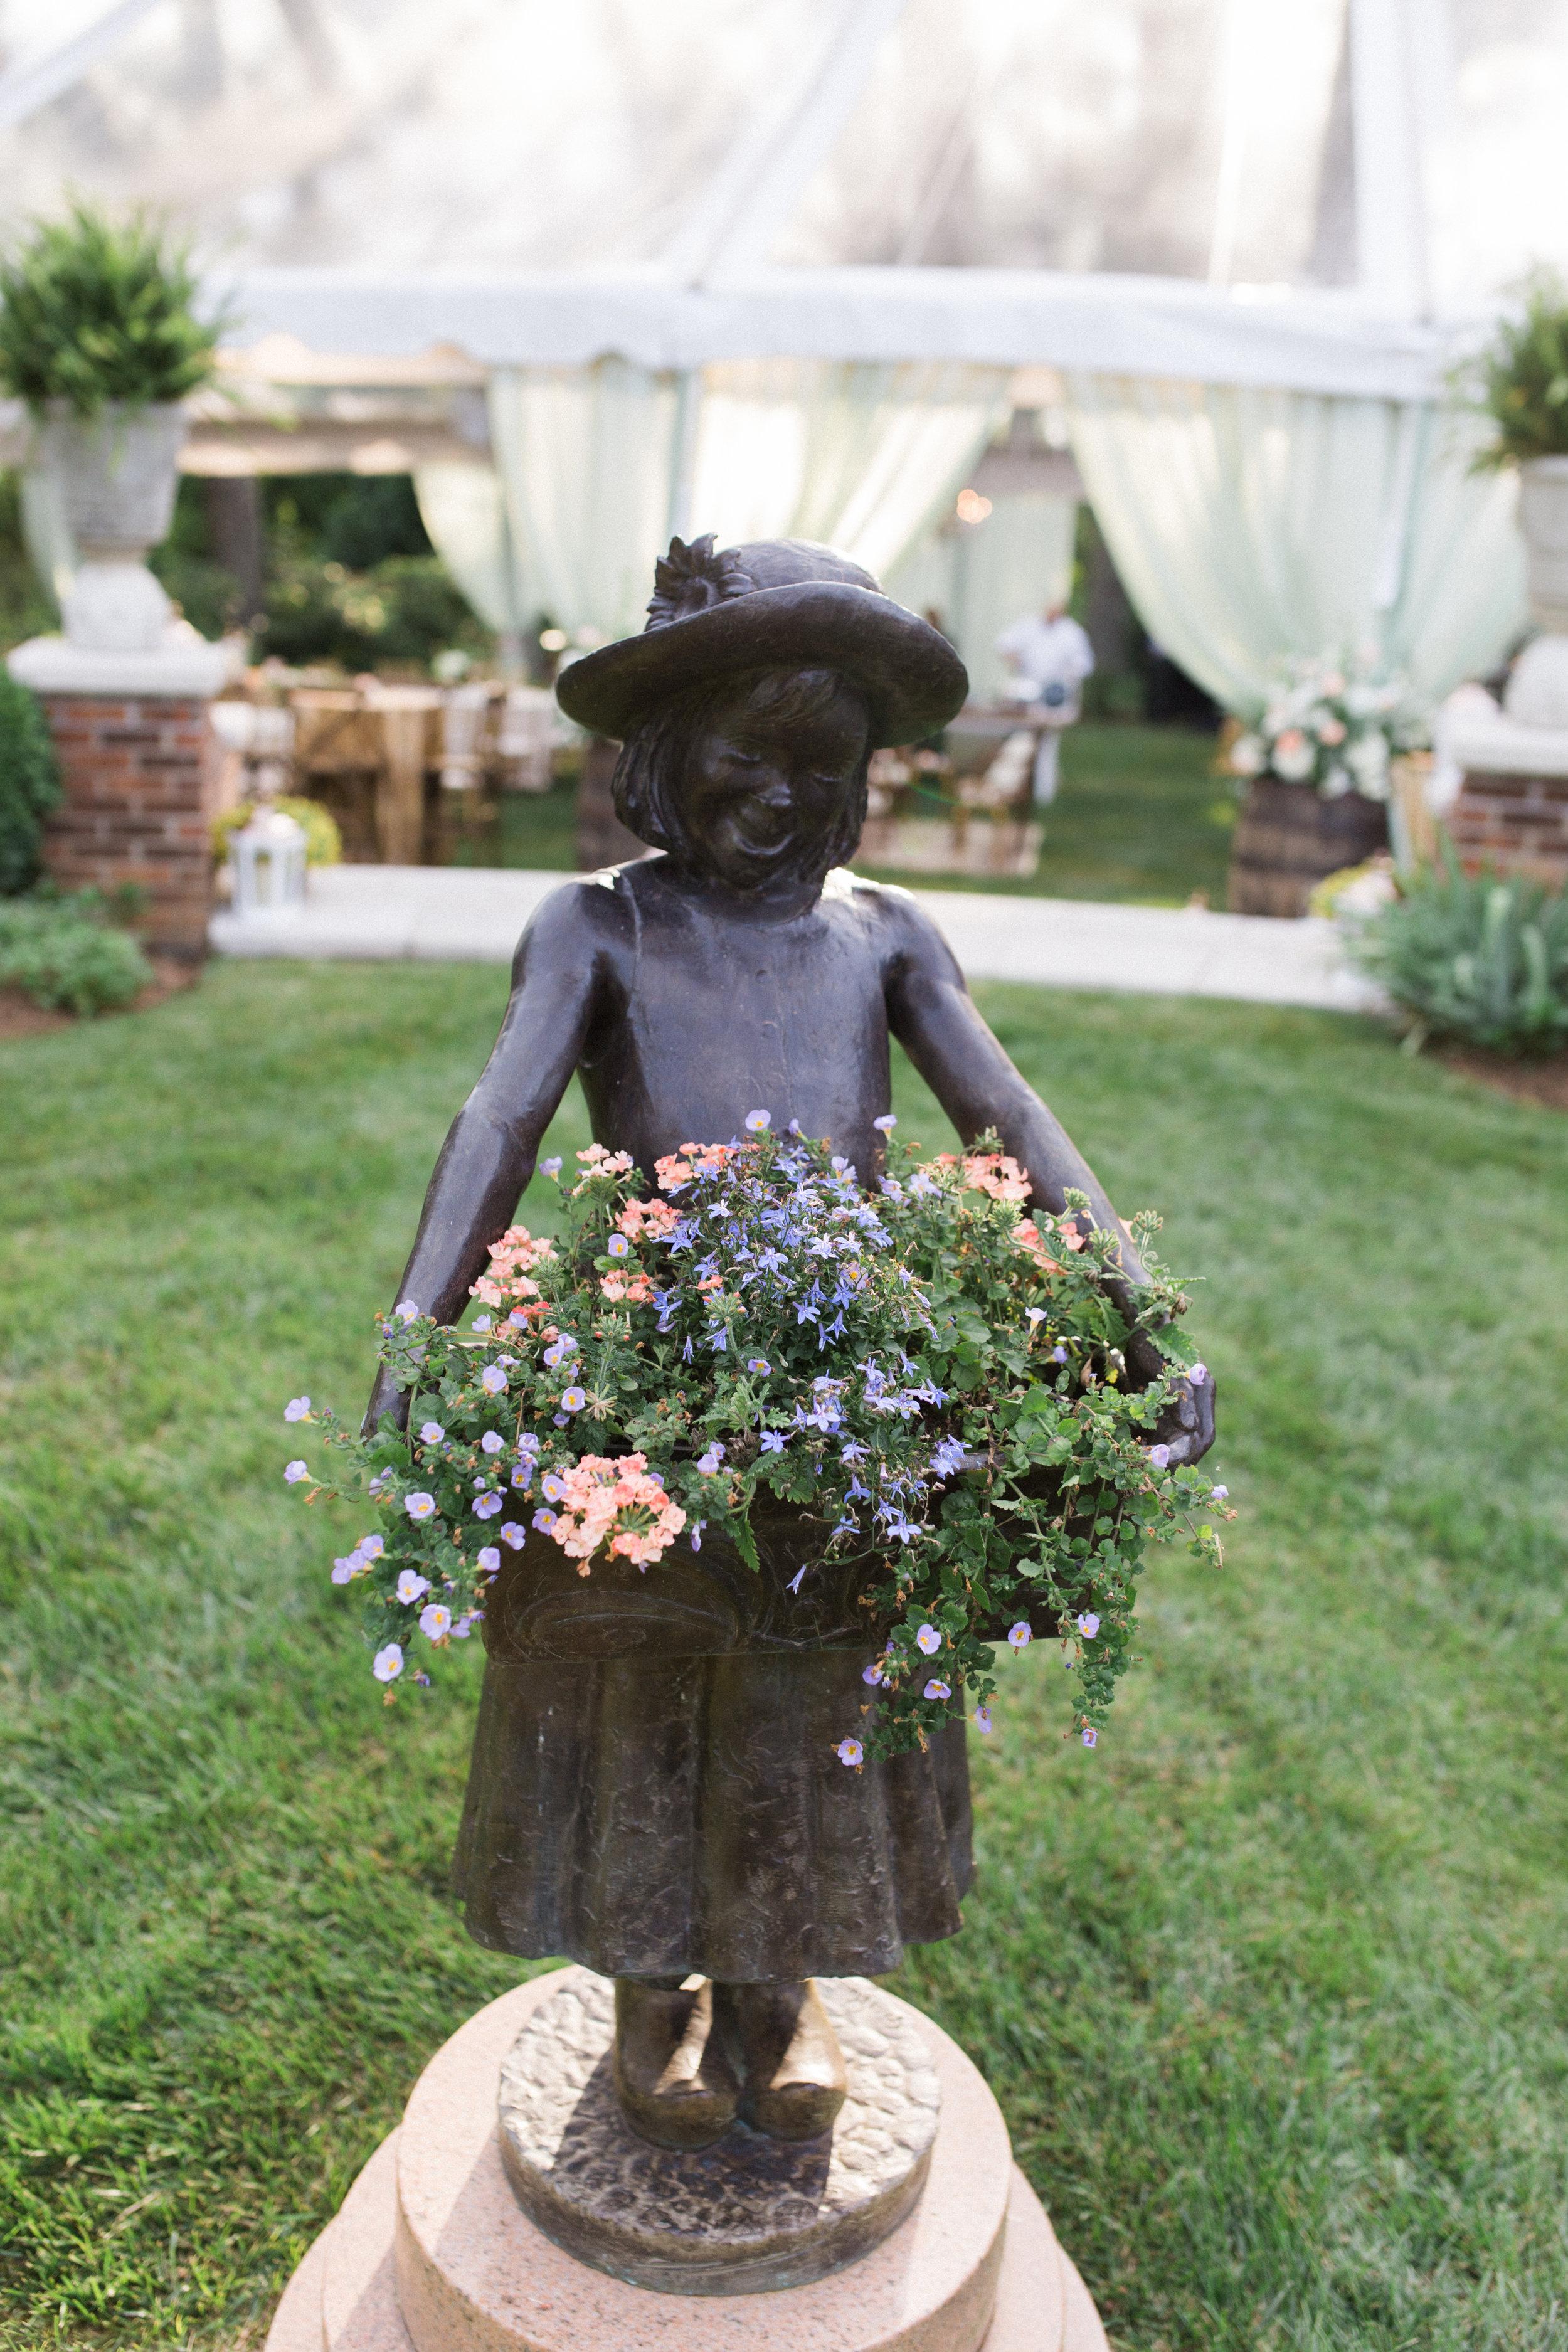 2fbbf-virginiatentedat-homeweddingdecorflowersvirginiatentedat-homeweddingdecorflowers.jpg